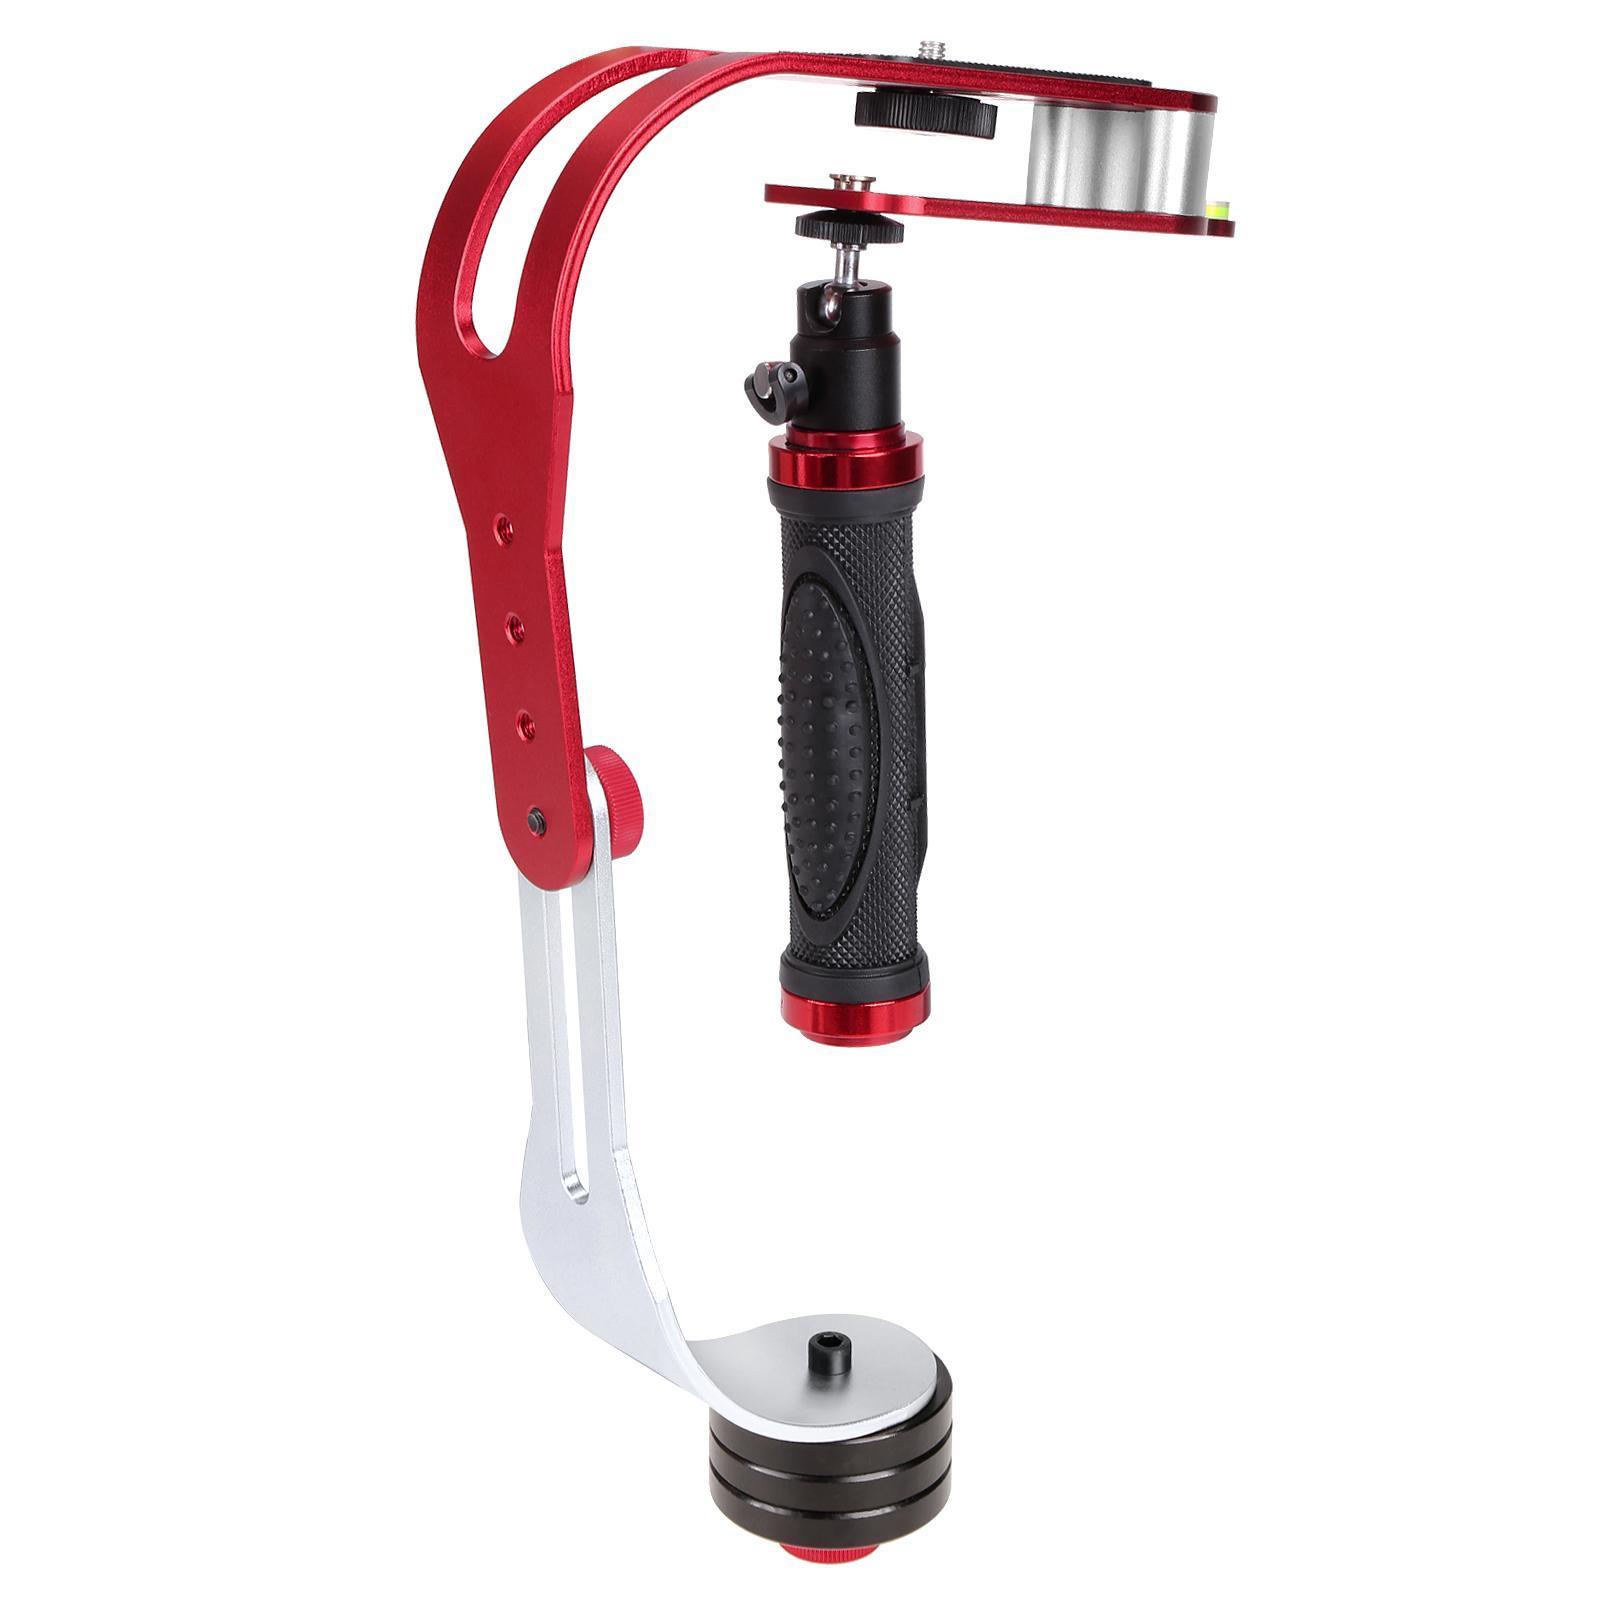 Hand-held Steady Cam Video Stabilizer Motion Steadicam Cam For DSLR Camera Camcorder 0